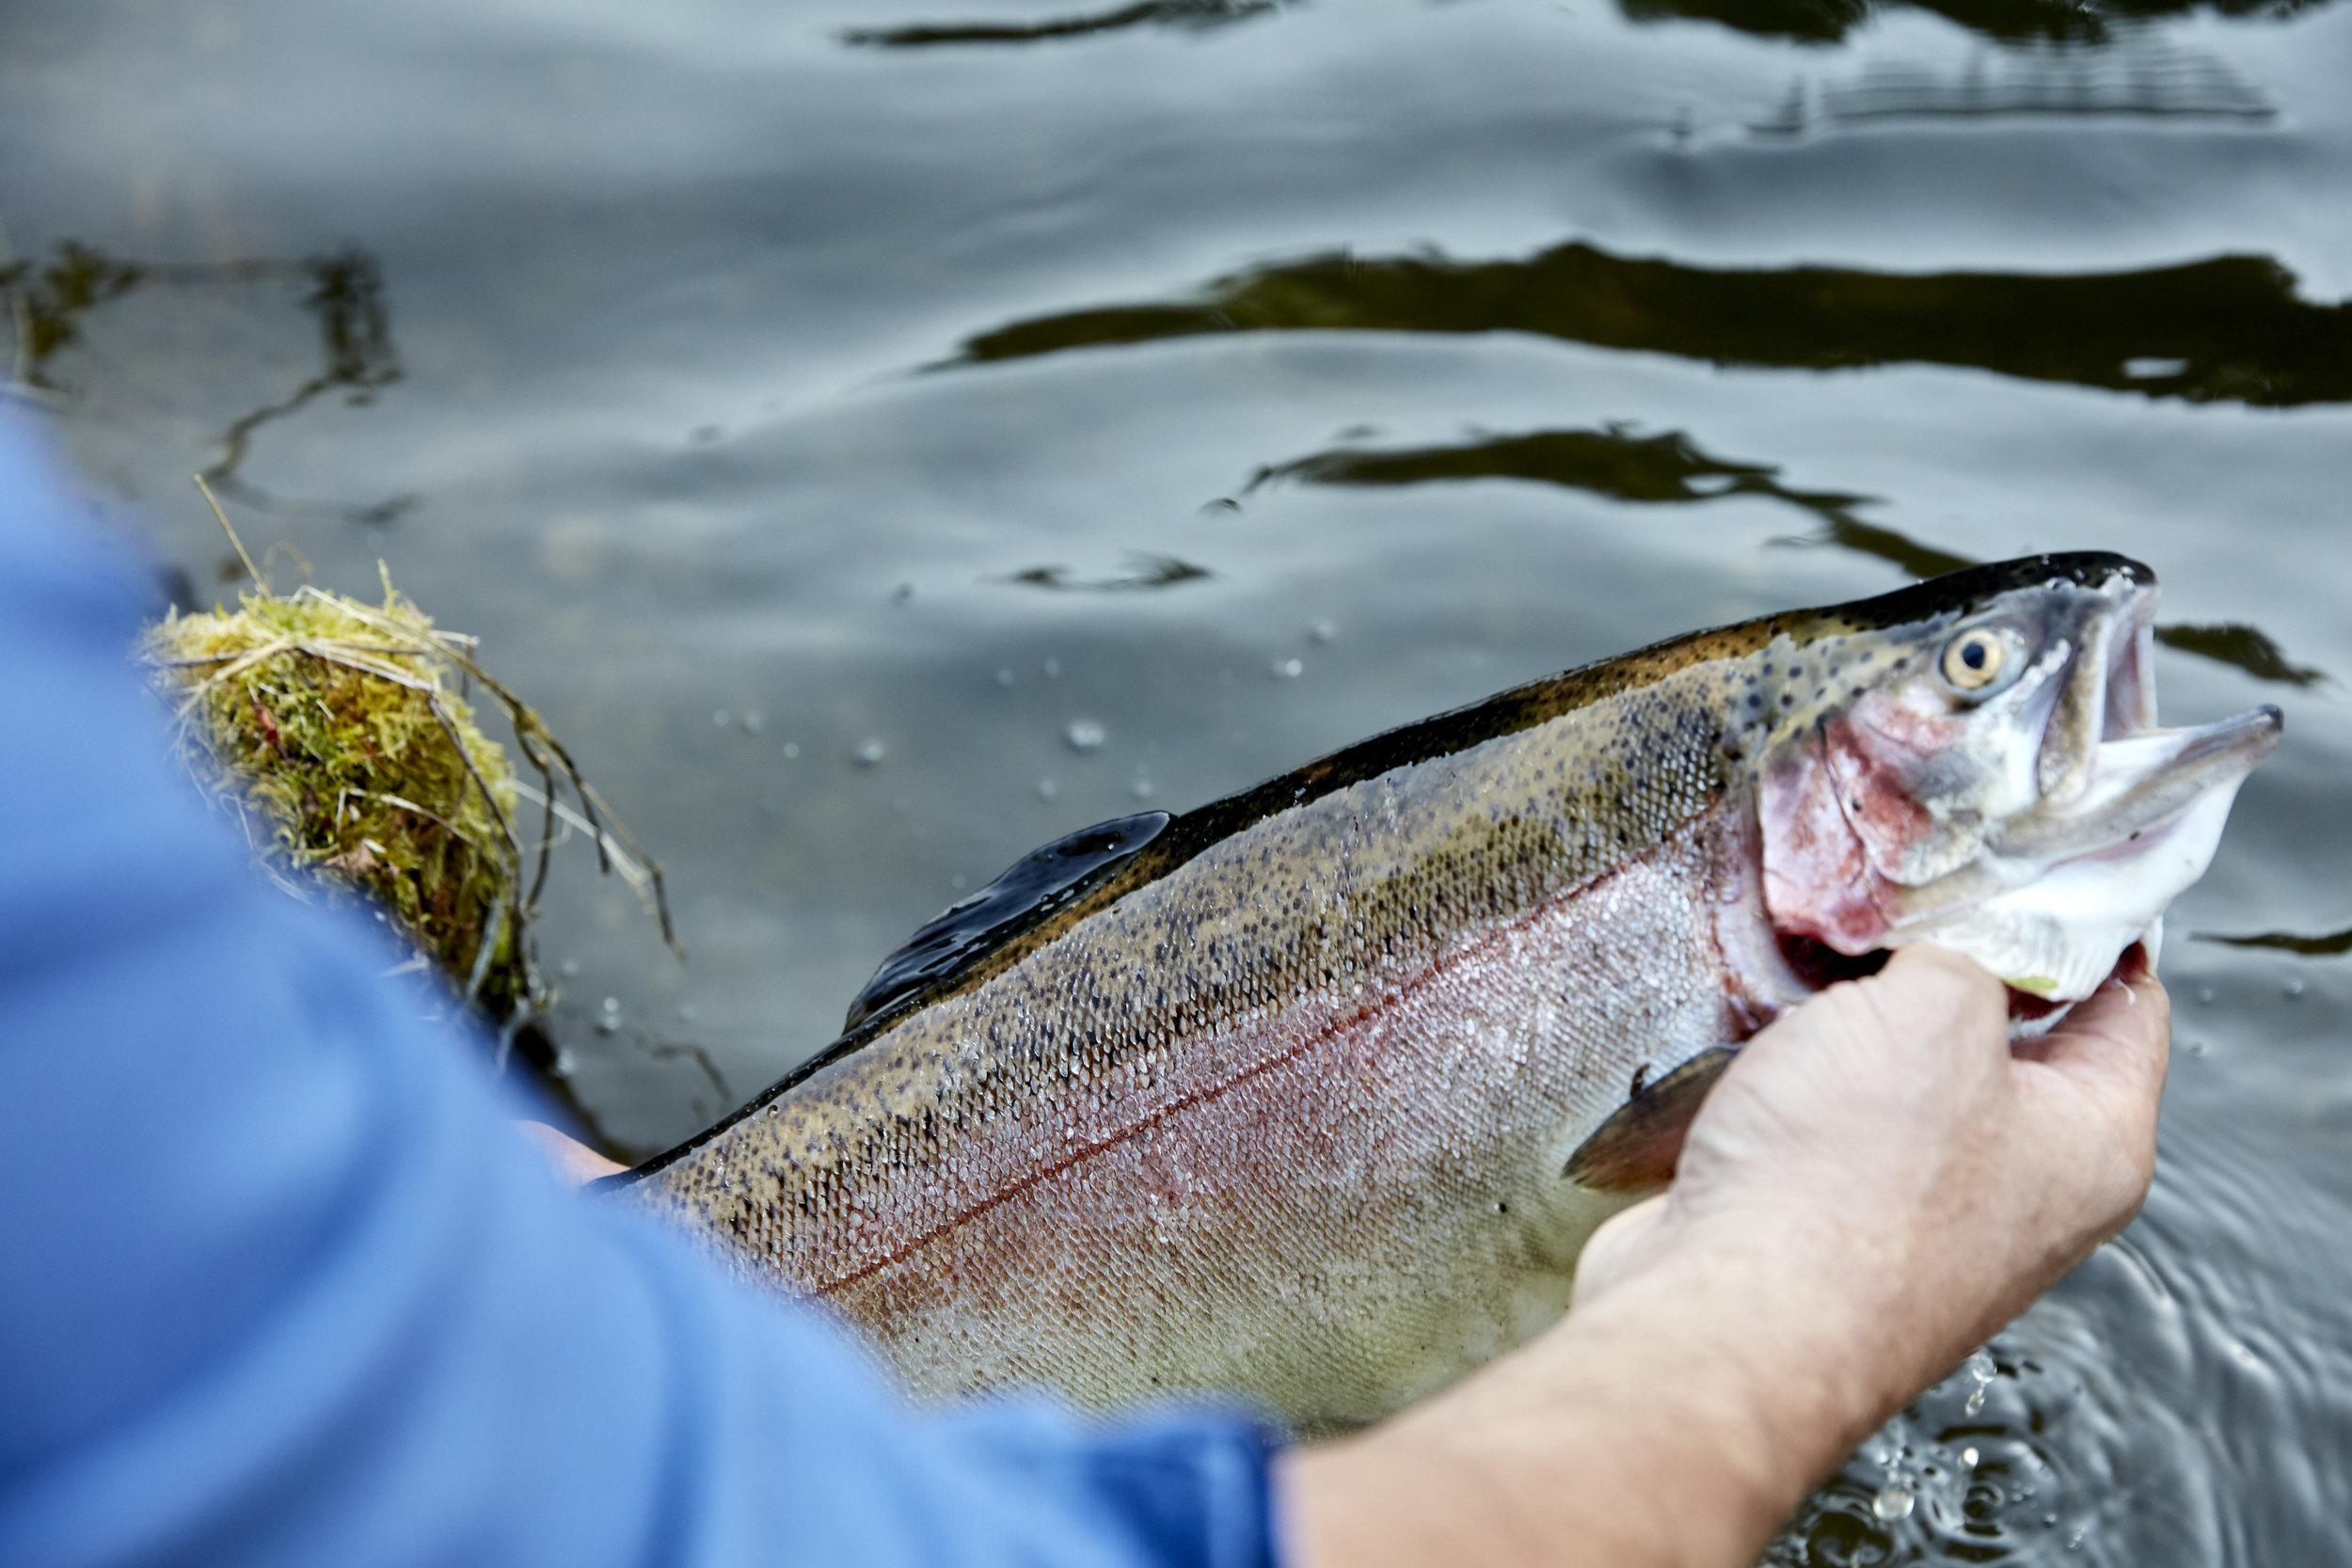 WW_TRAFALGAR_FISHERIES_EDIT_021.JPG